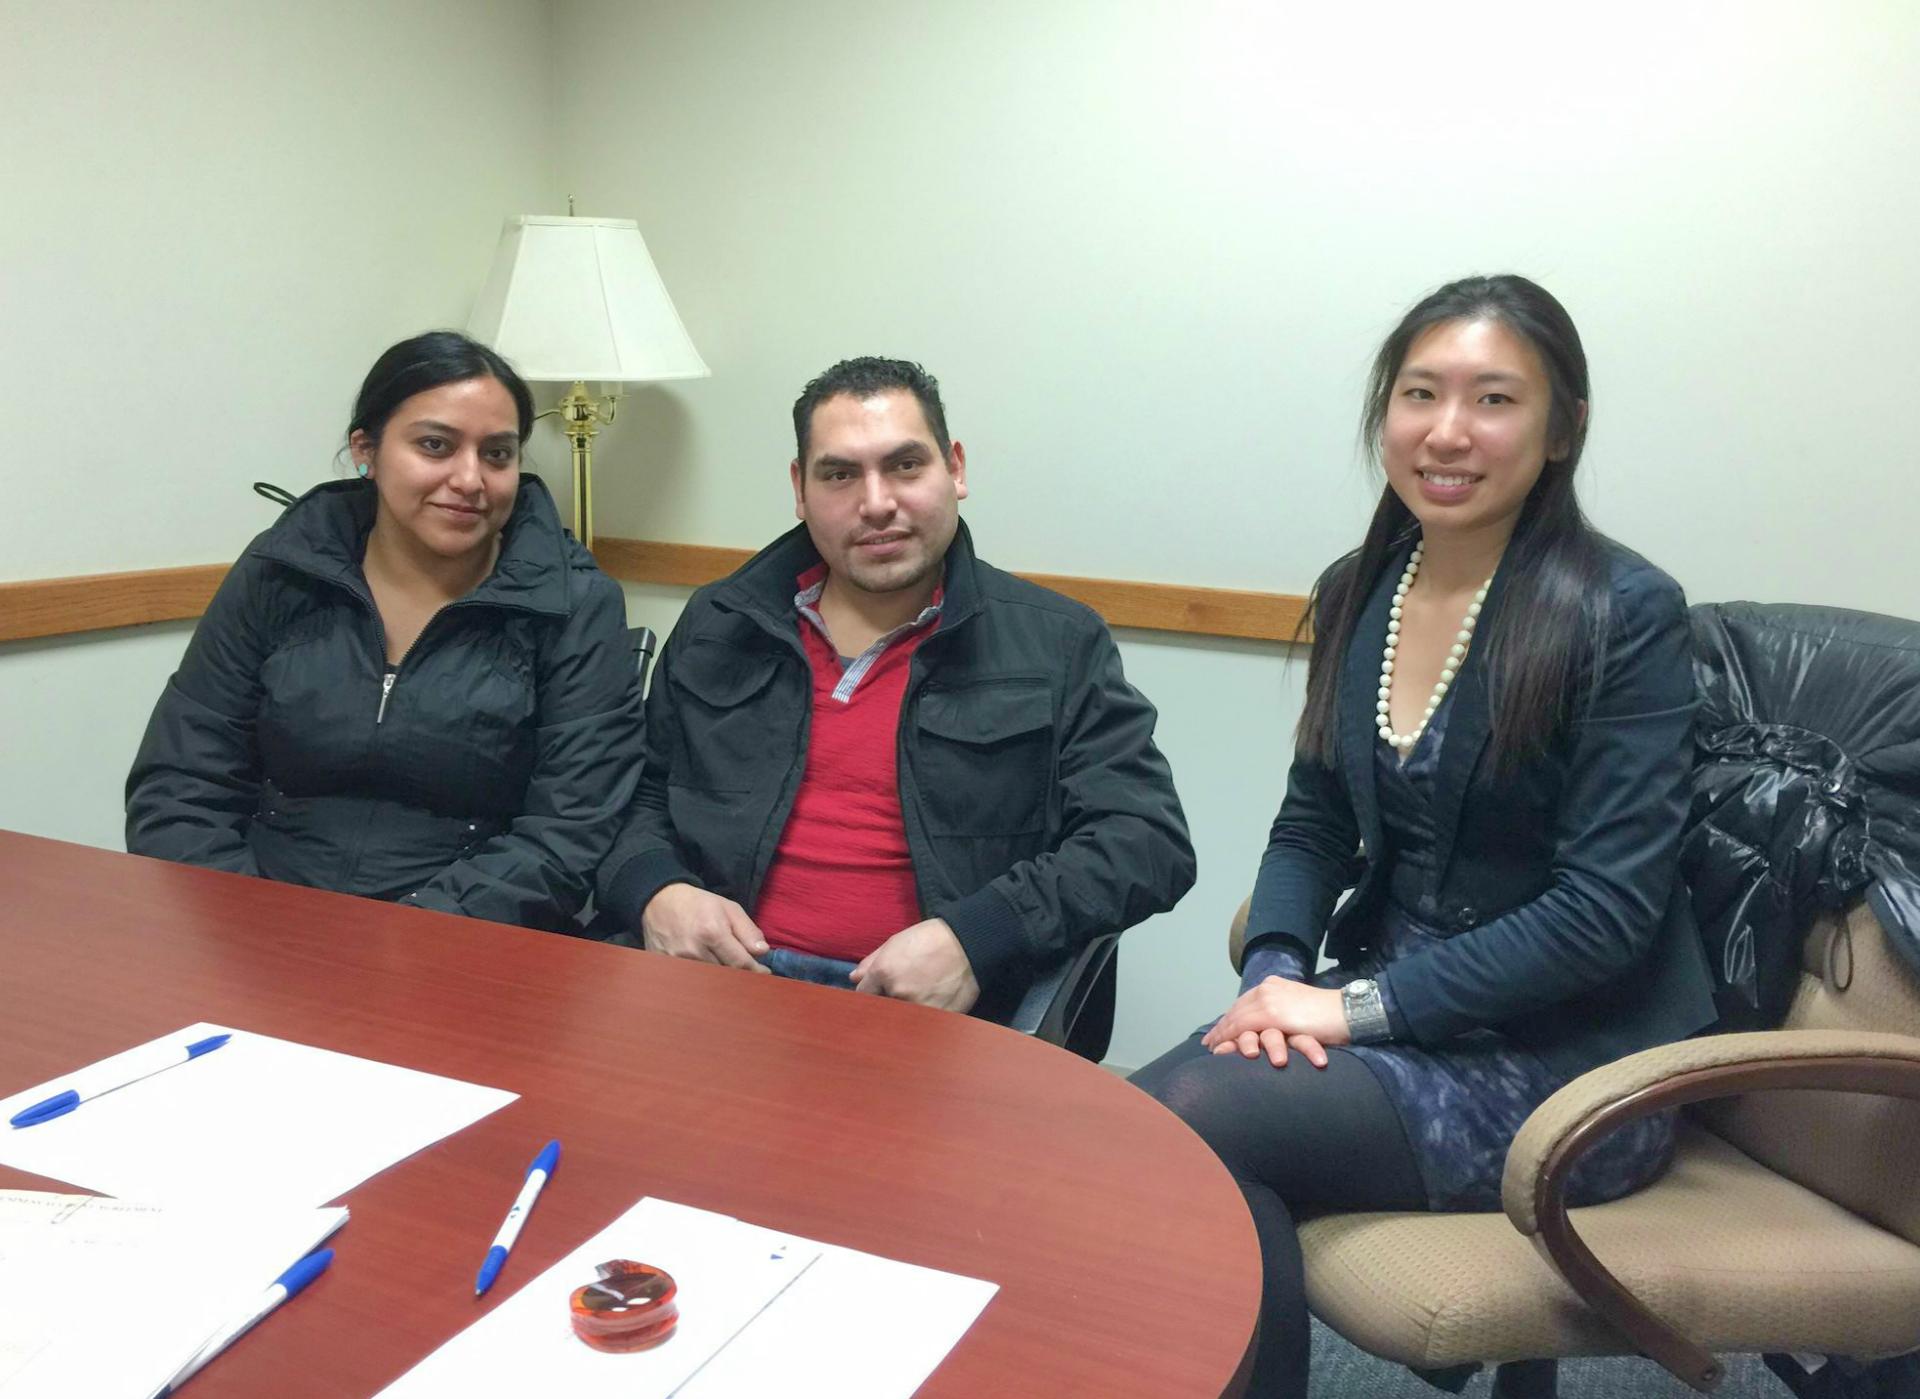 Lisa Yang '17, right, with Hamilton Microfinance loan recipient Lourdes Alvarez and her husband.